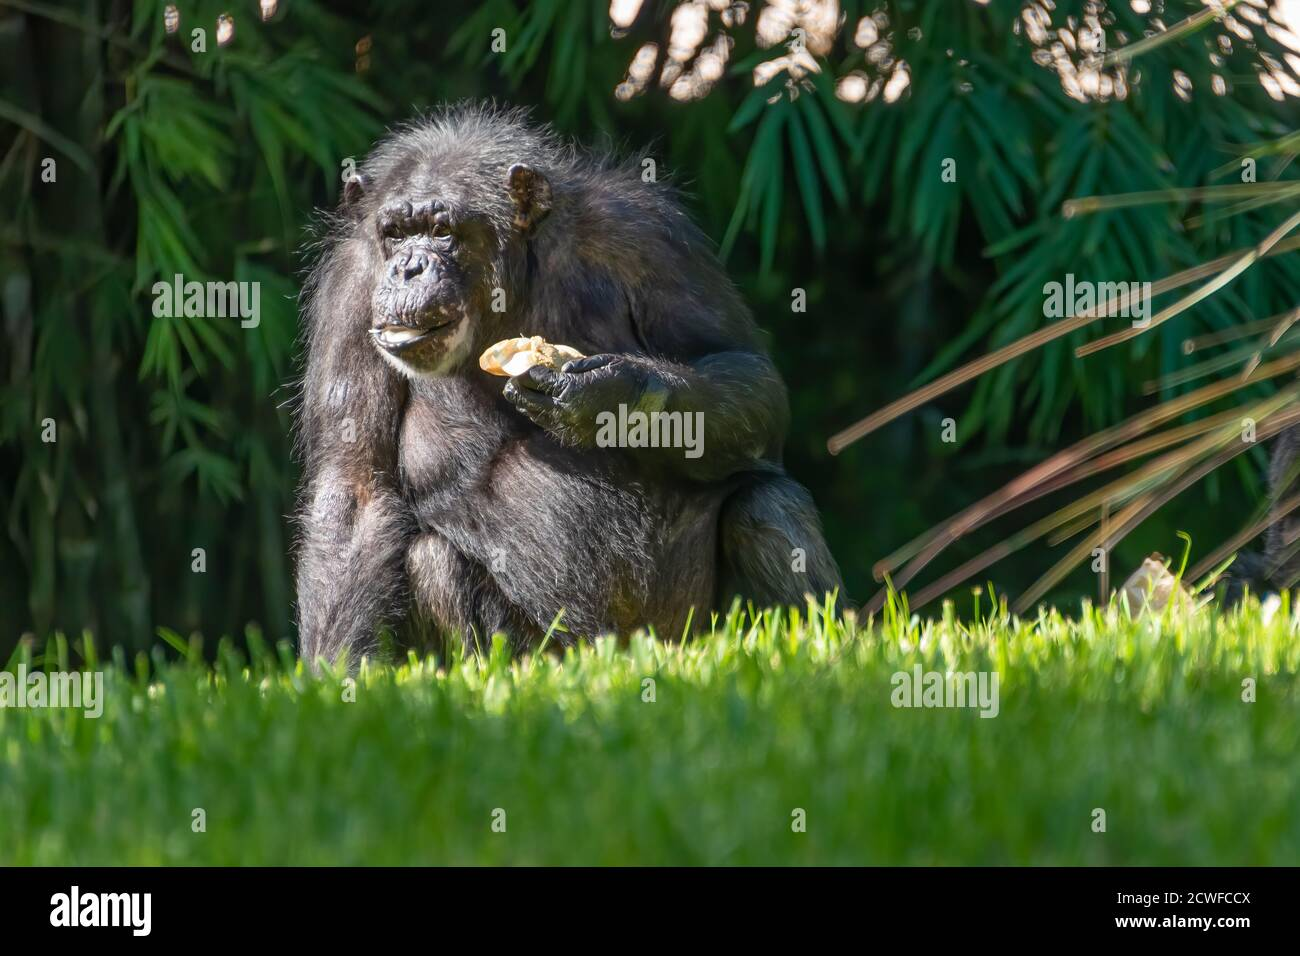 Large chimpanzee (Pan troglodytes) at Busch Gardens Tampa Bay in Tampa, Florida. (USA) Stock Photo